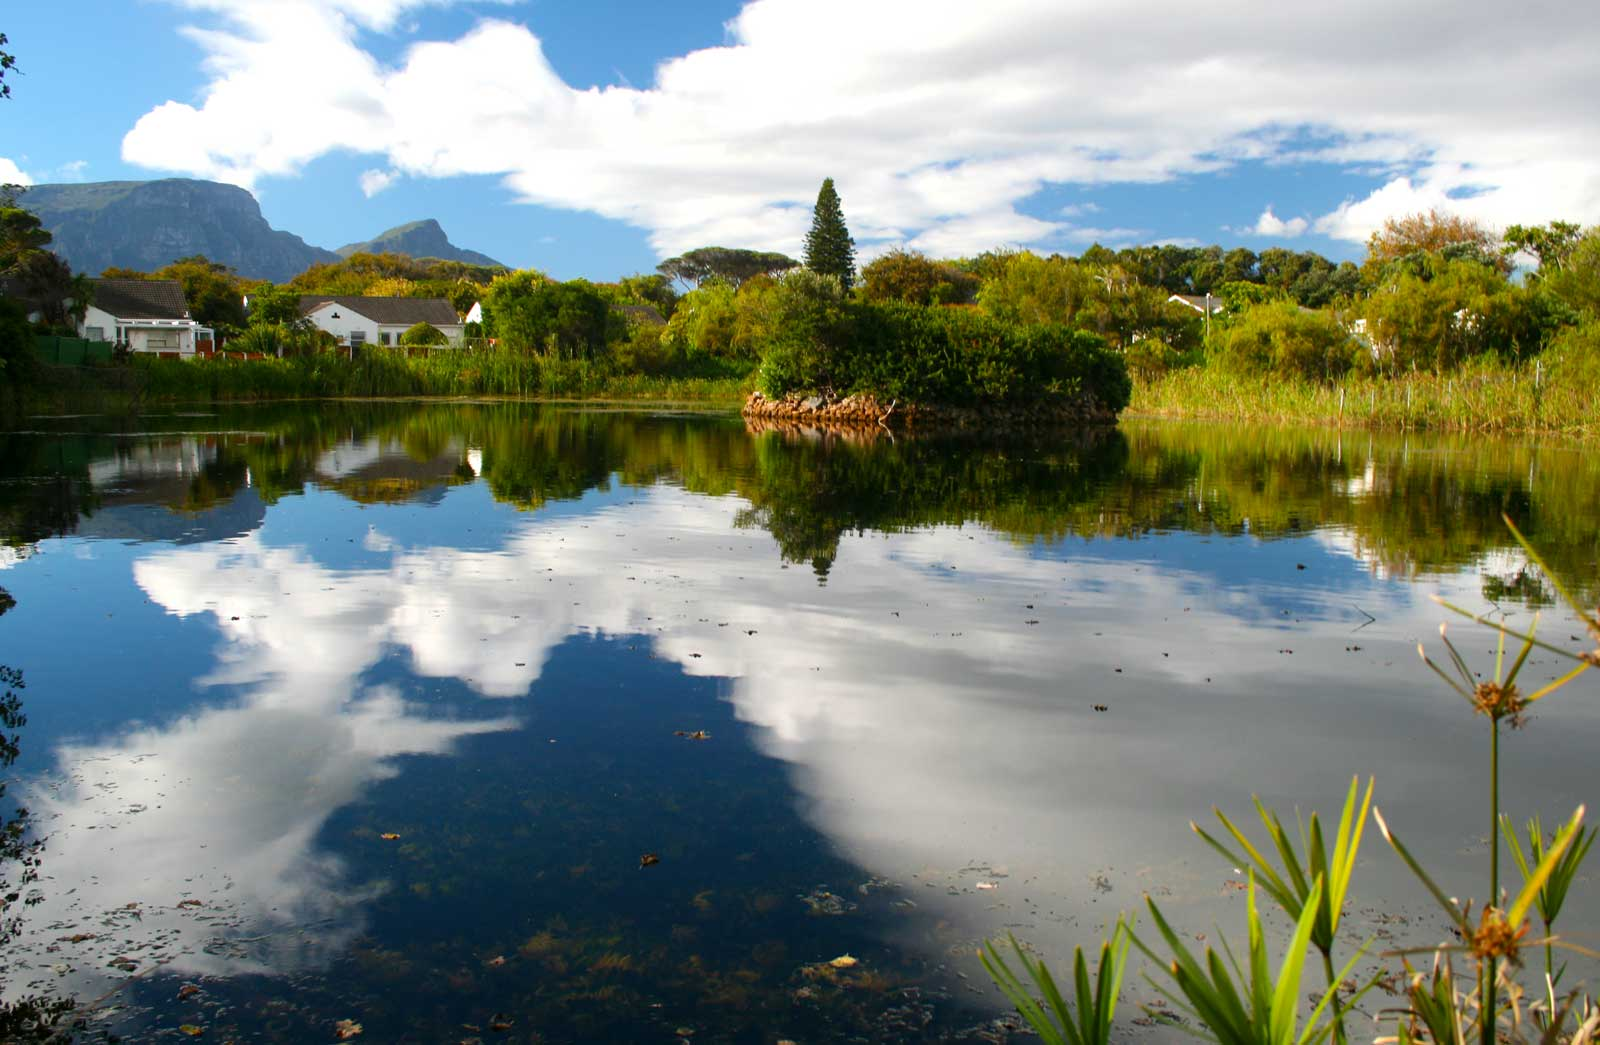 view of Die Oog from the water